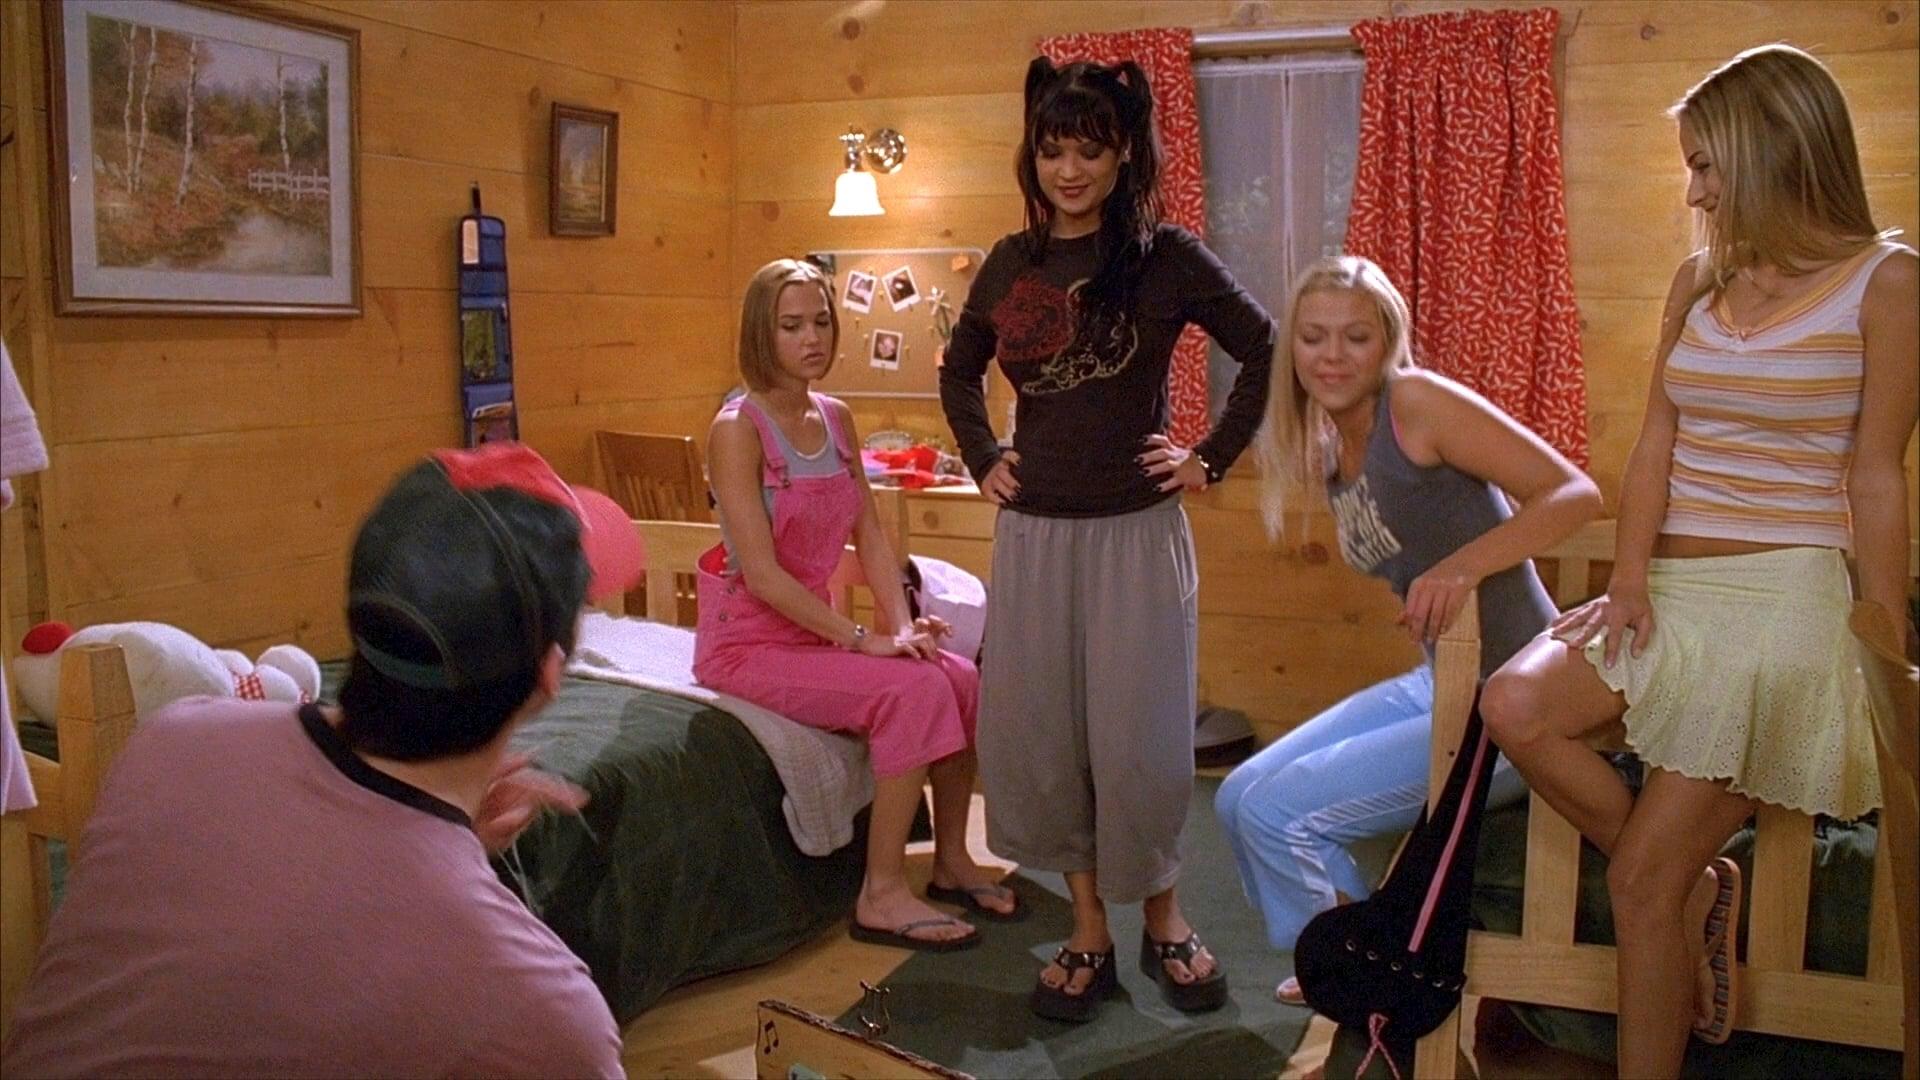 American Pie Campamento De Bandas american pie presents: band camp (2005) - full hd movies to